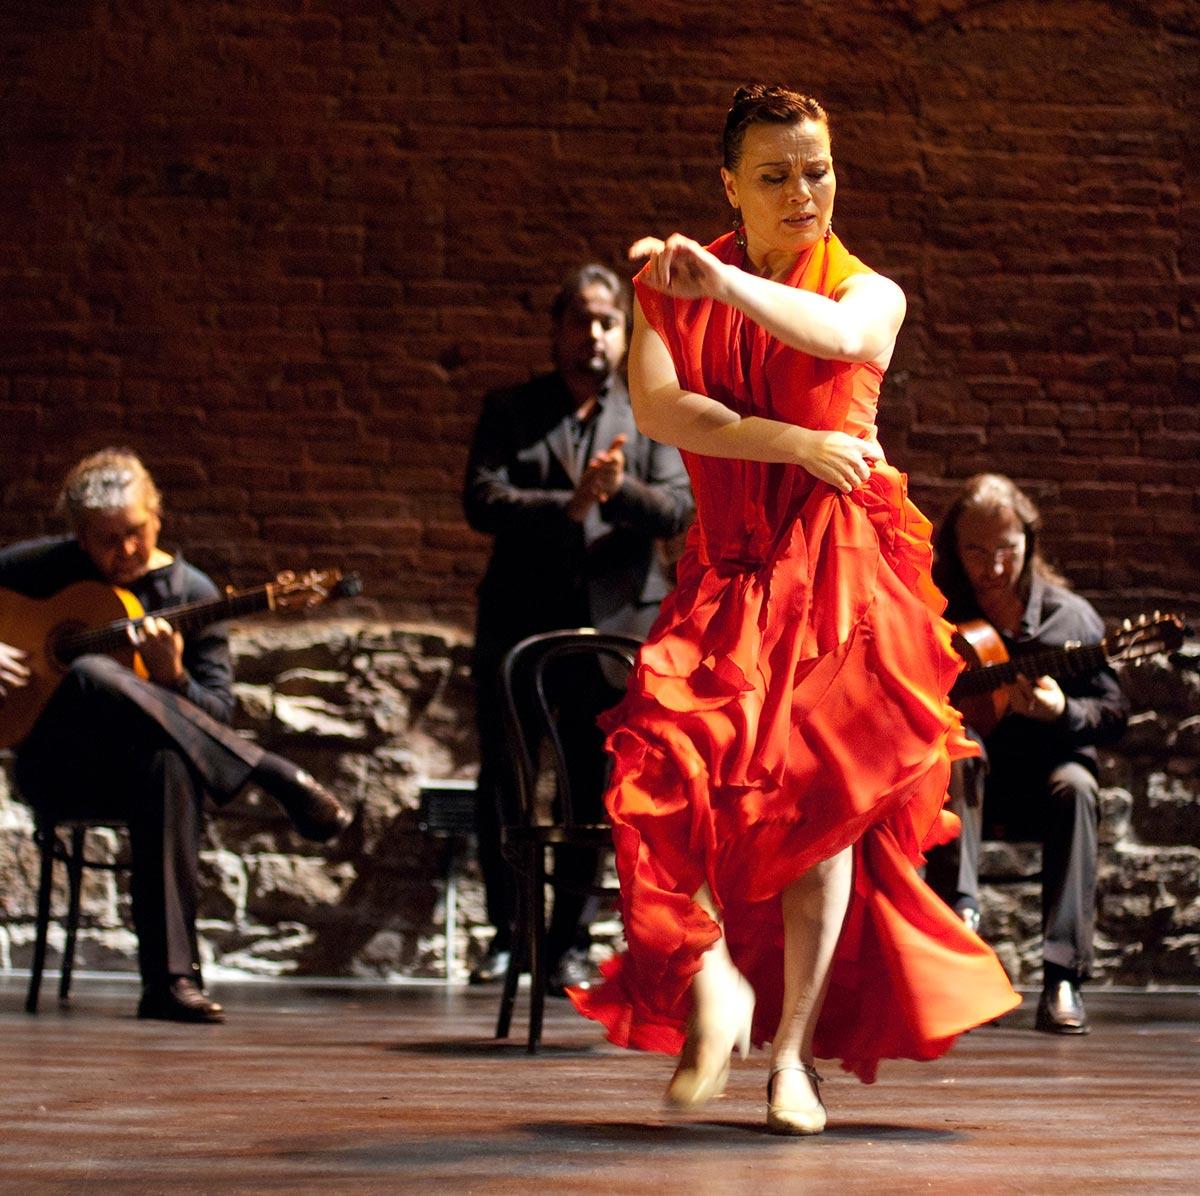 Soledad Barrio performing at Cherry Lane Theatre in New York City.